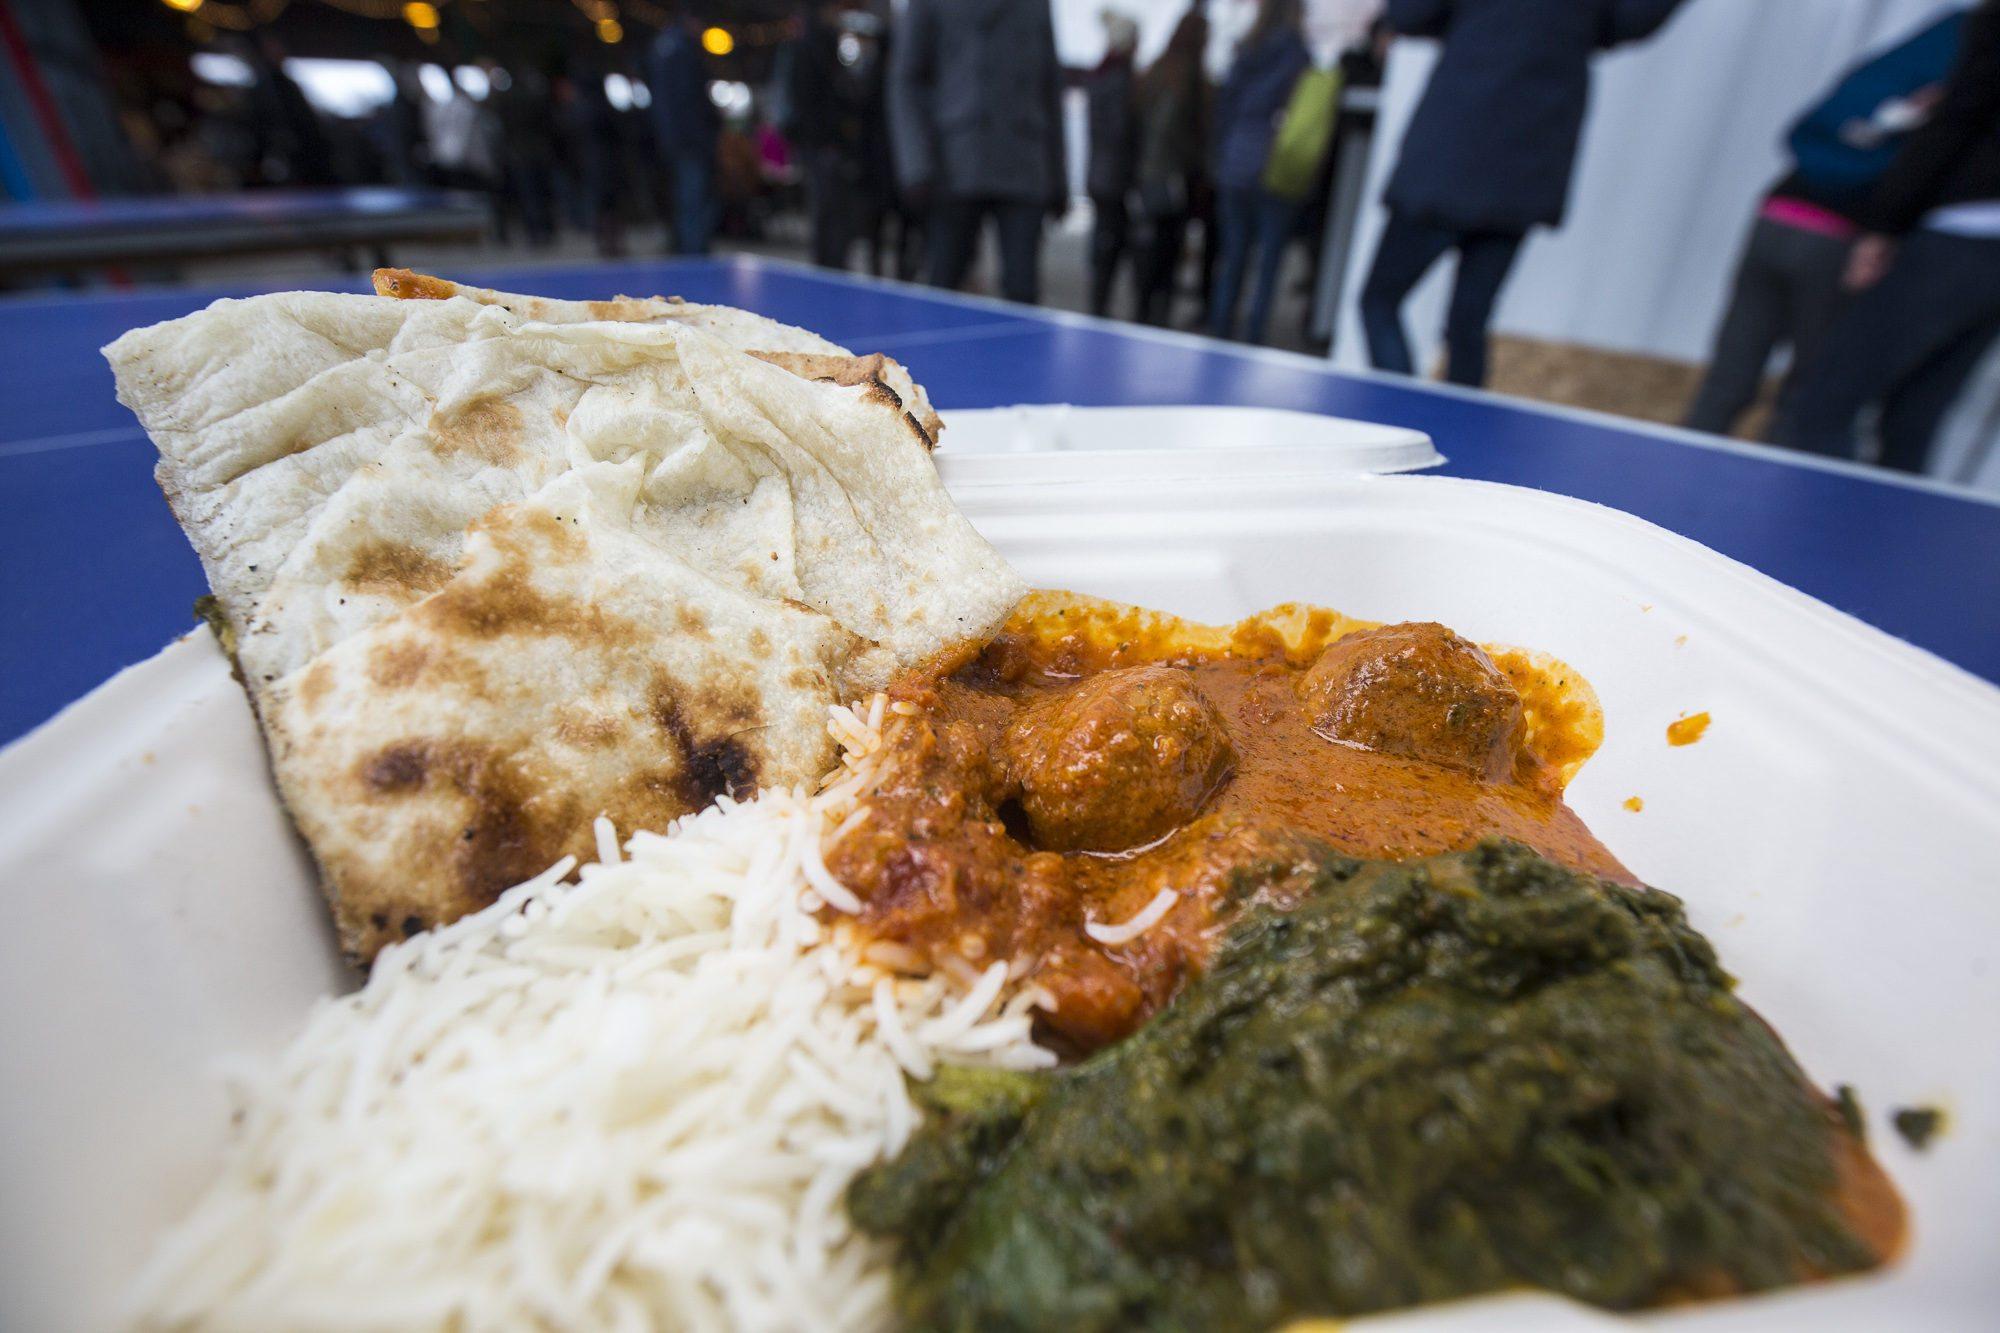 toronto-food-events-evergreen-brick-works-winter-village-christmas-market-indian-street-food-co